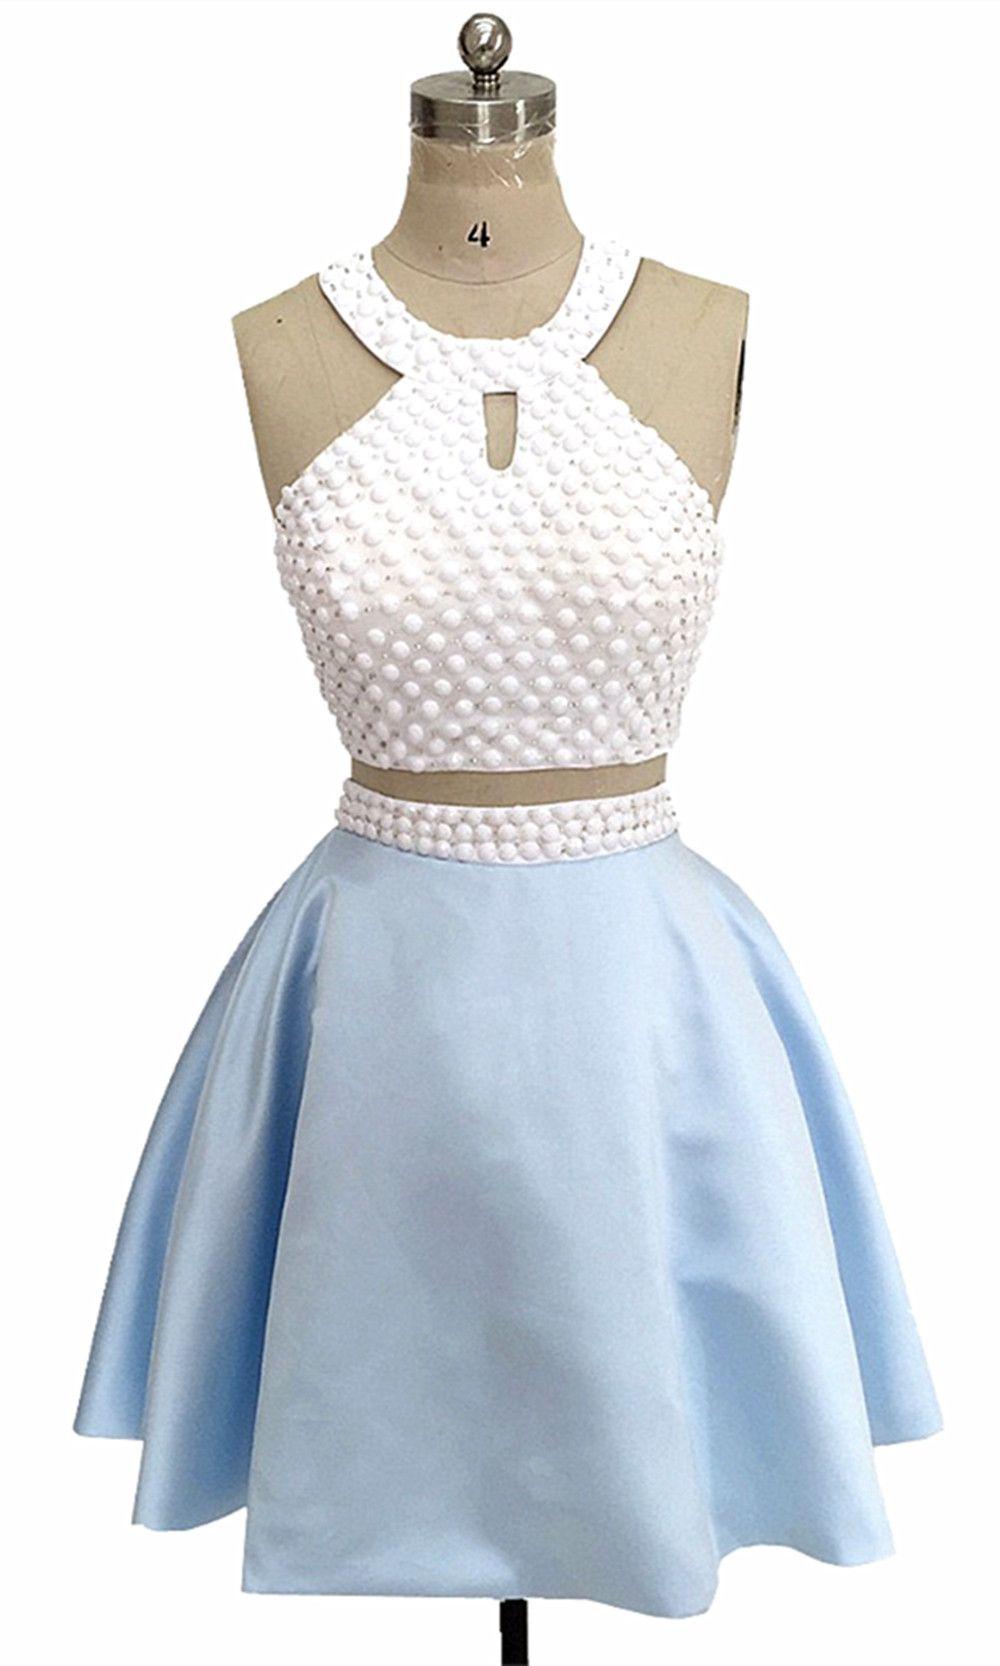 51c1676cb Homecoming Dress 2019 Graduation Dress For Student Blue Short Prom Dress  Two Pieces Evening Dress  zhuetsydress wedding party dress for bridesmaid